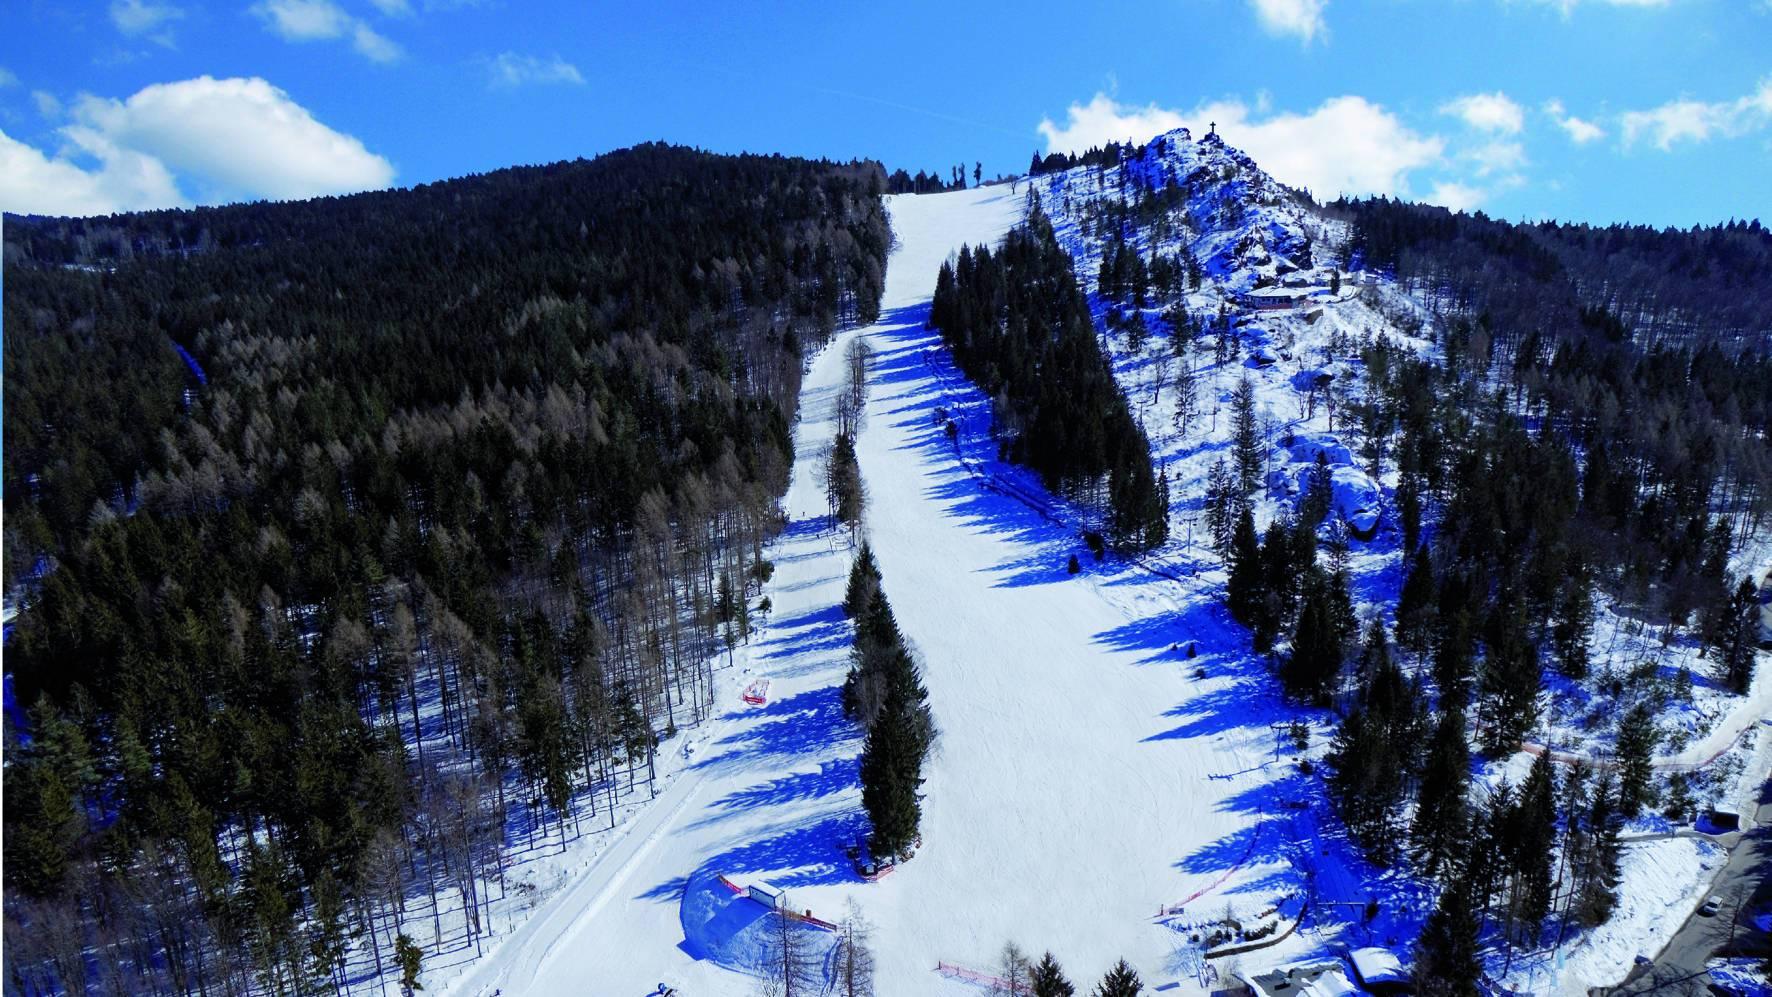 Skipass Silberberg